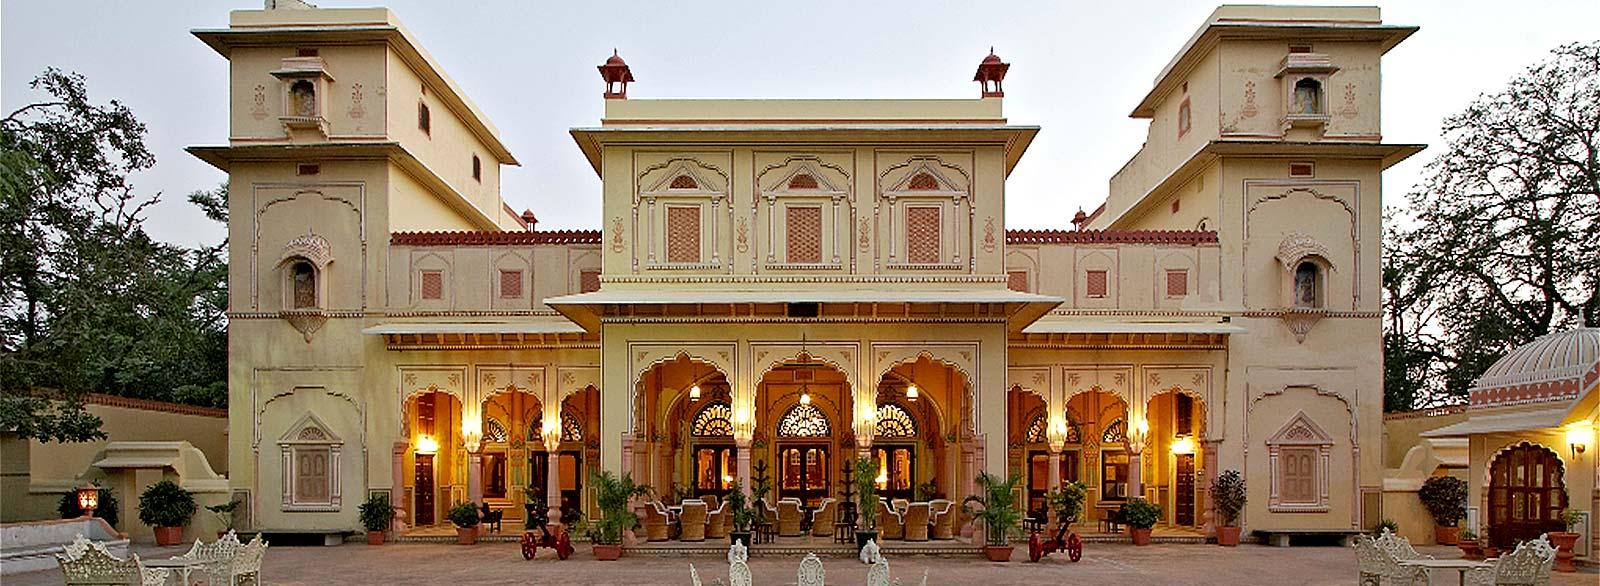 Hotel Narayan Niwas Palace - Malka Pol - Jaisalmer Image